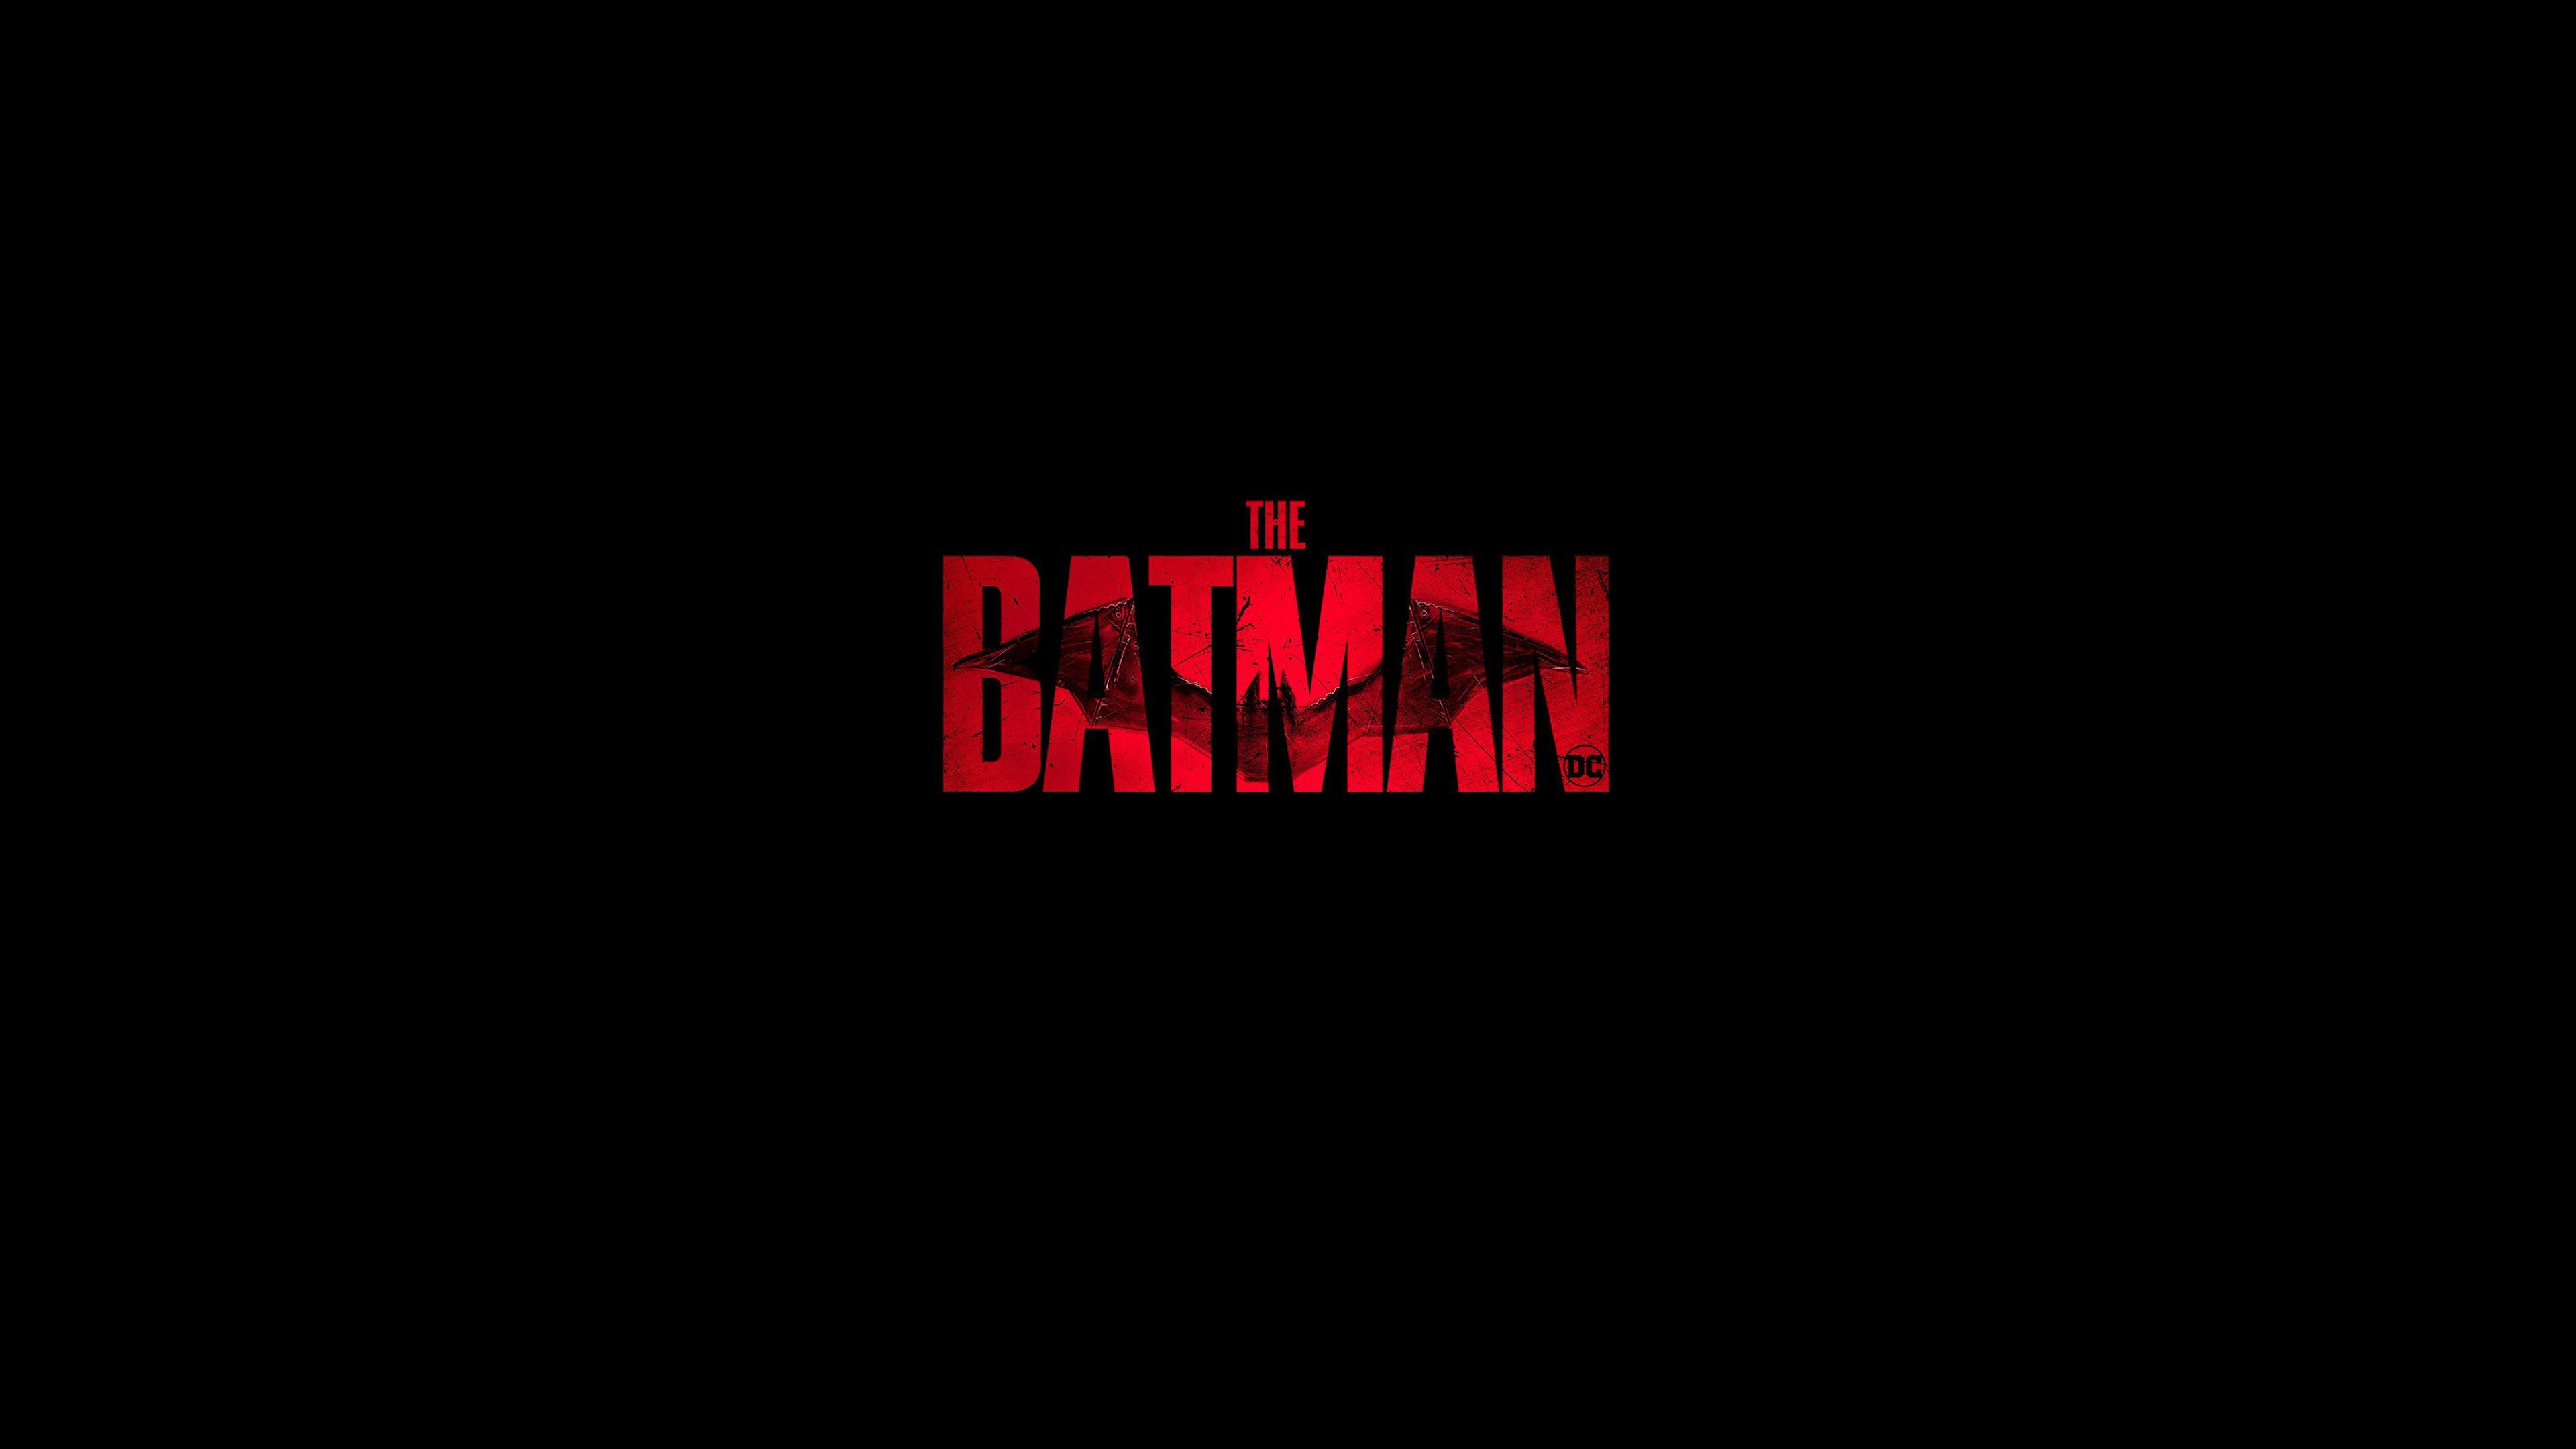 The Batman 2021 Logo Wallpapers 3840x2160